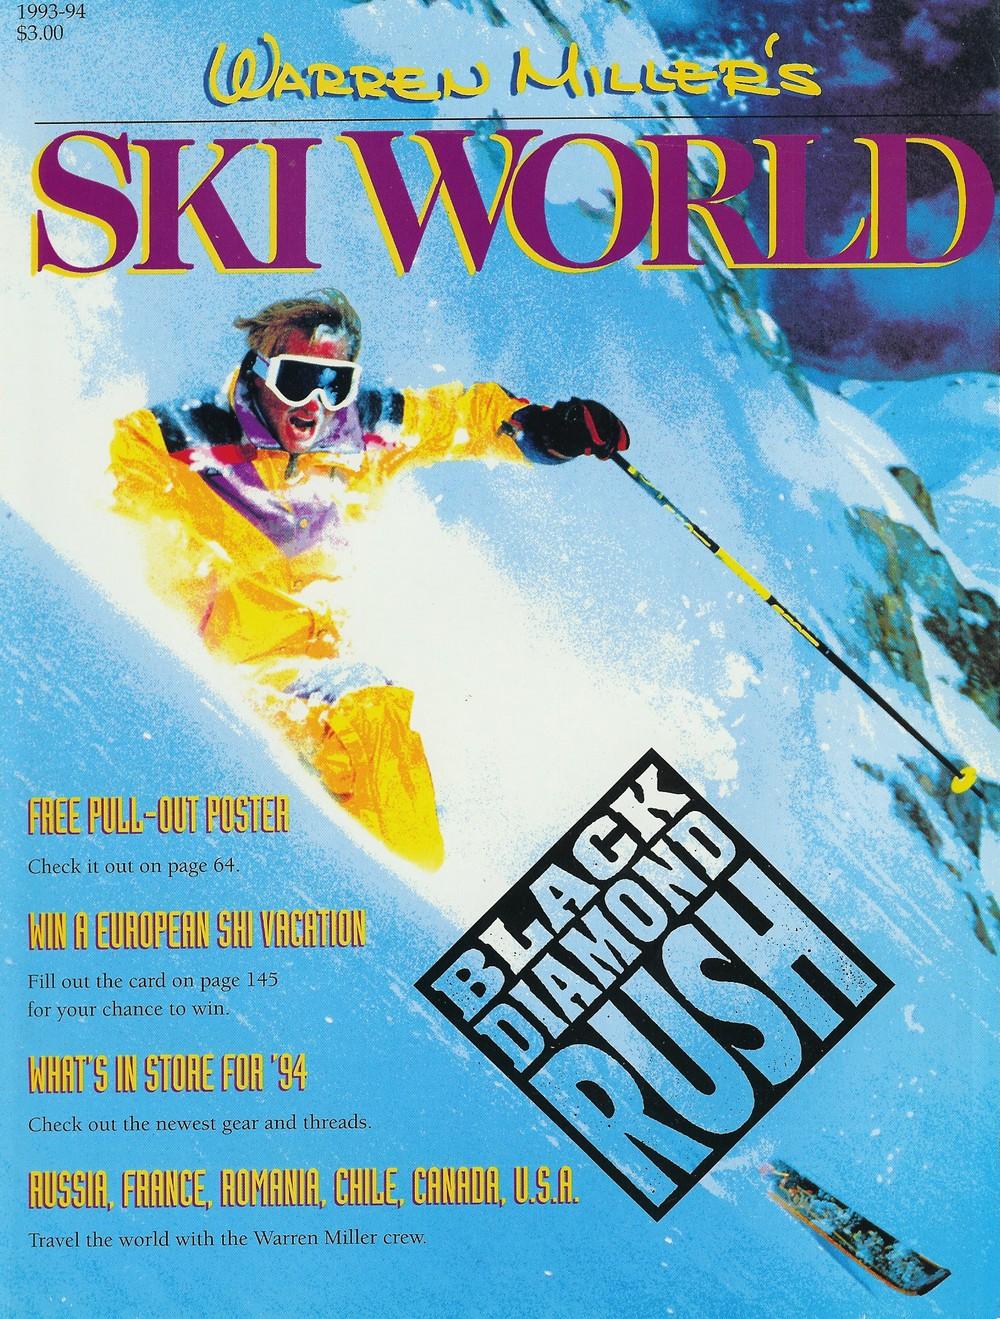 Magazine Cover2-Brad Vancour-1993.jpg